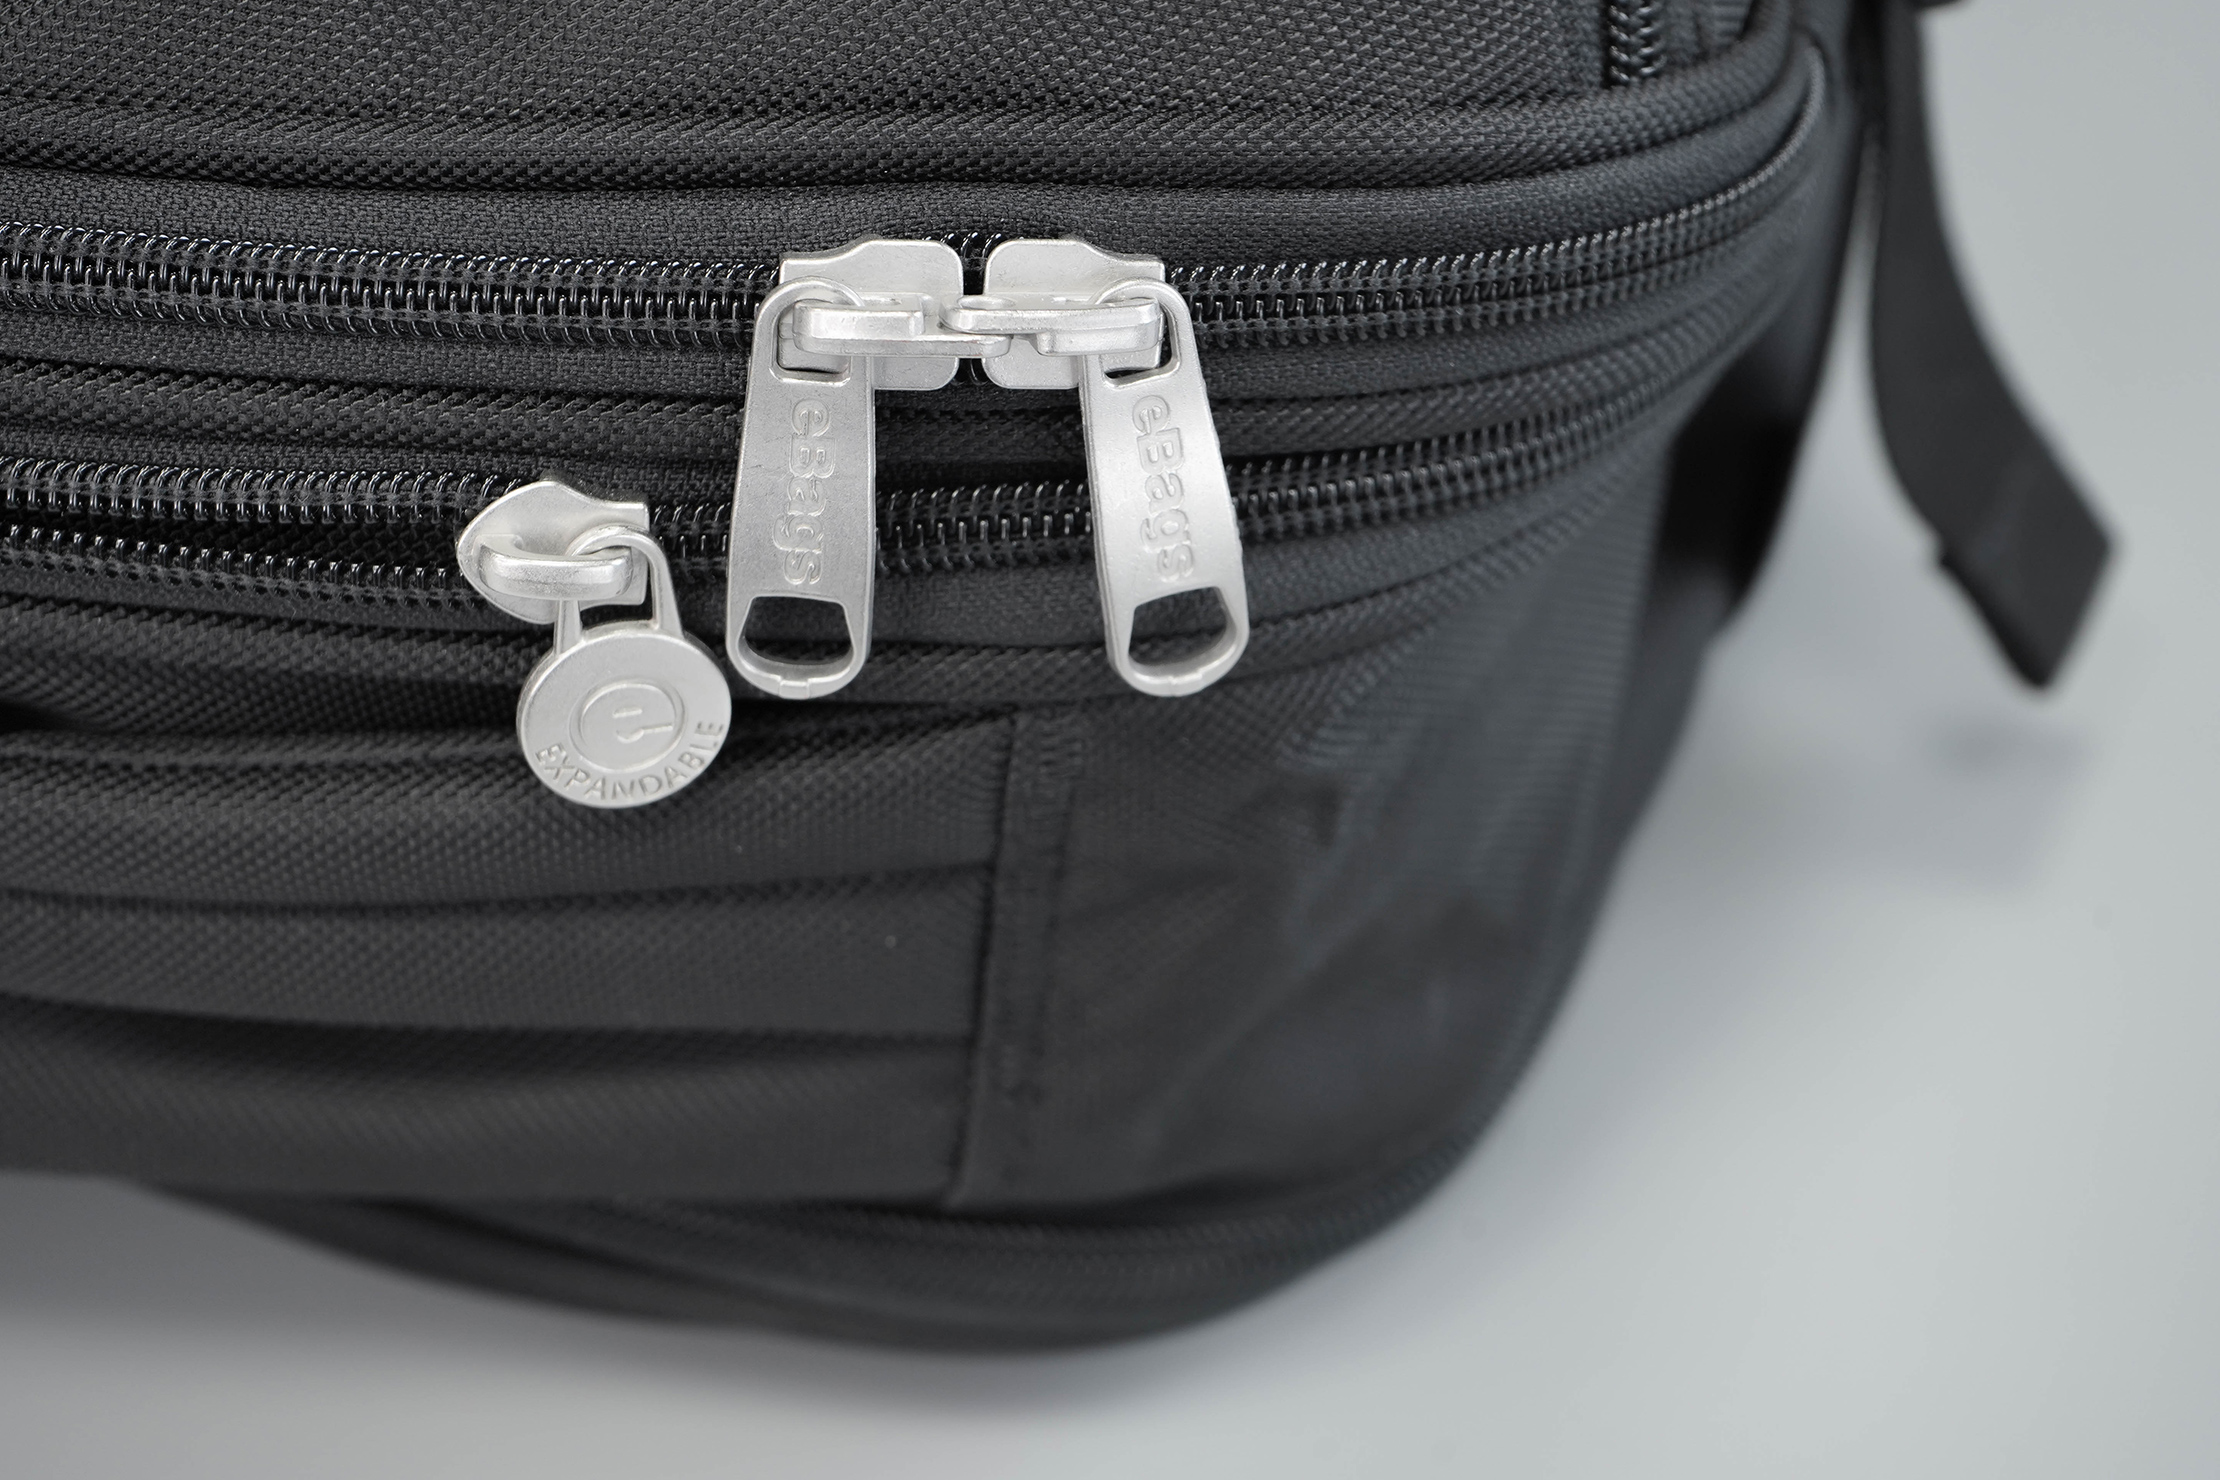 eBags TLS Mother Lode Weekender Convertible Zippers